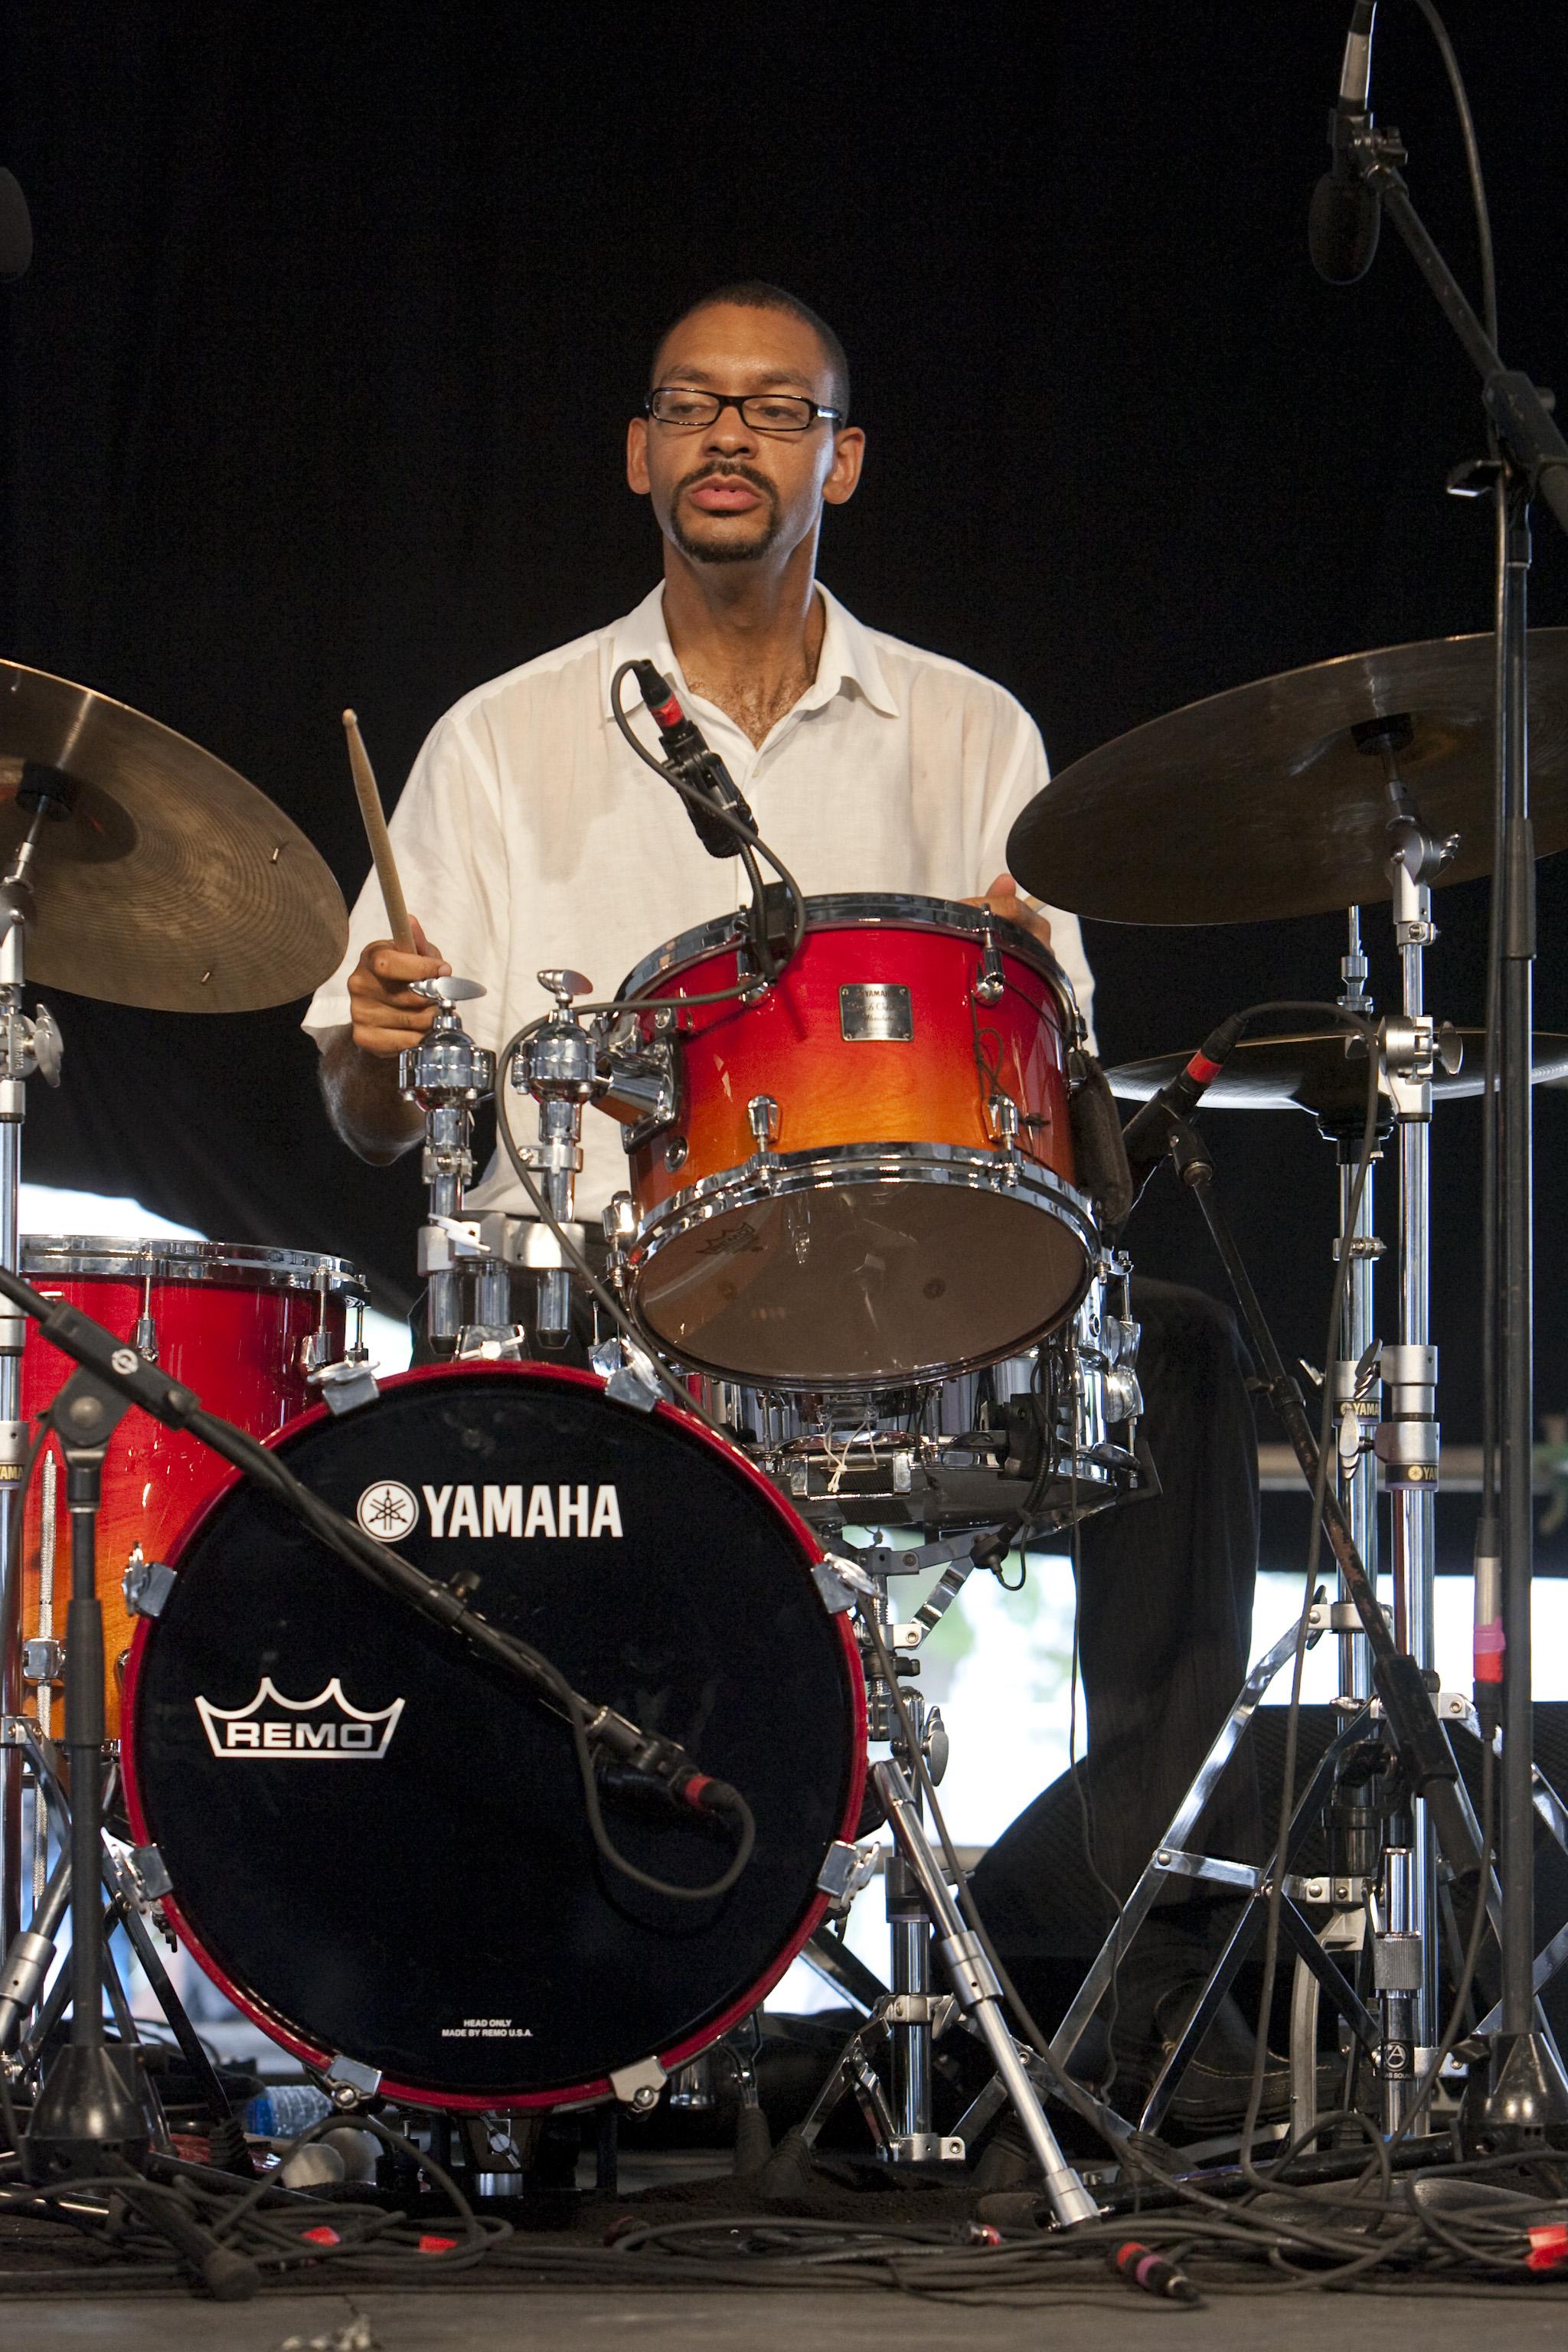 Jason Marsalis at the 40th Anniversary New Orleans Jazz & Heritage Festival, USA